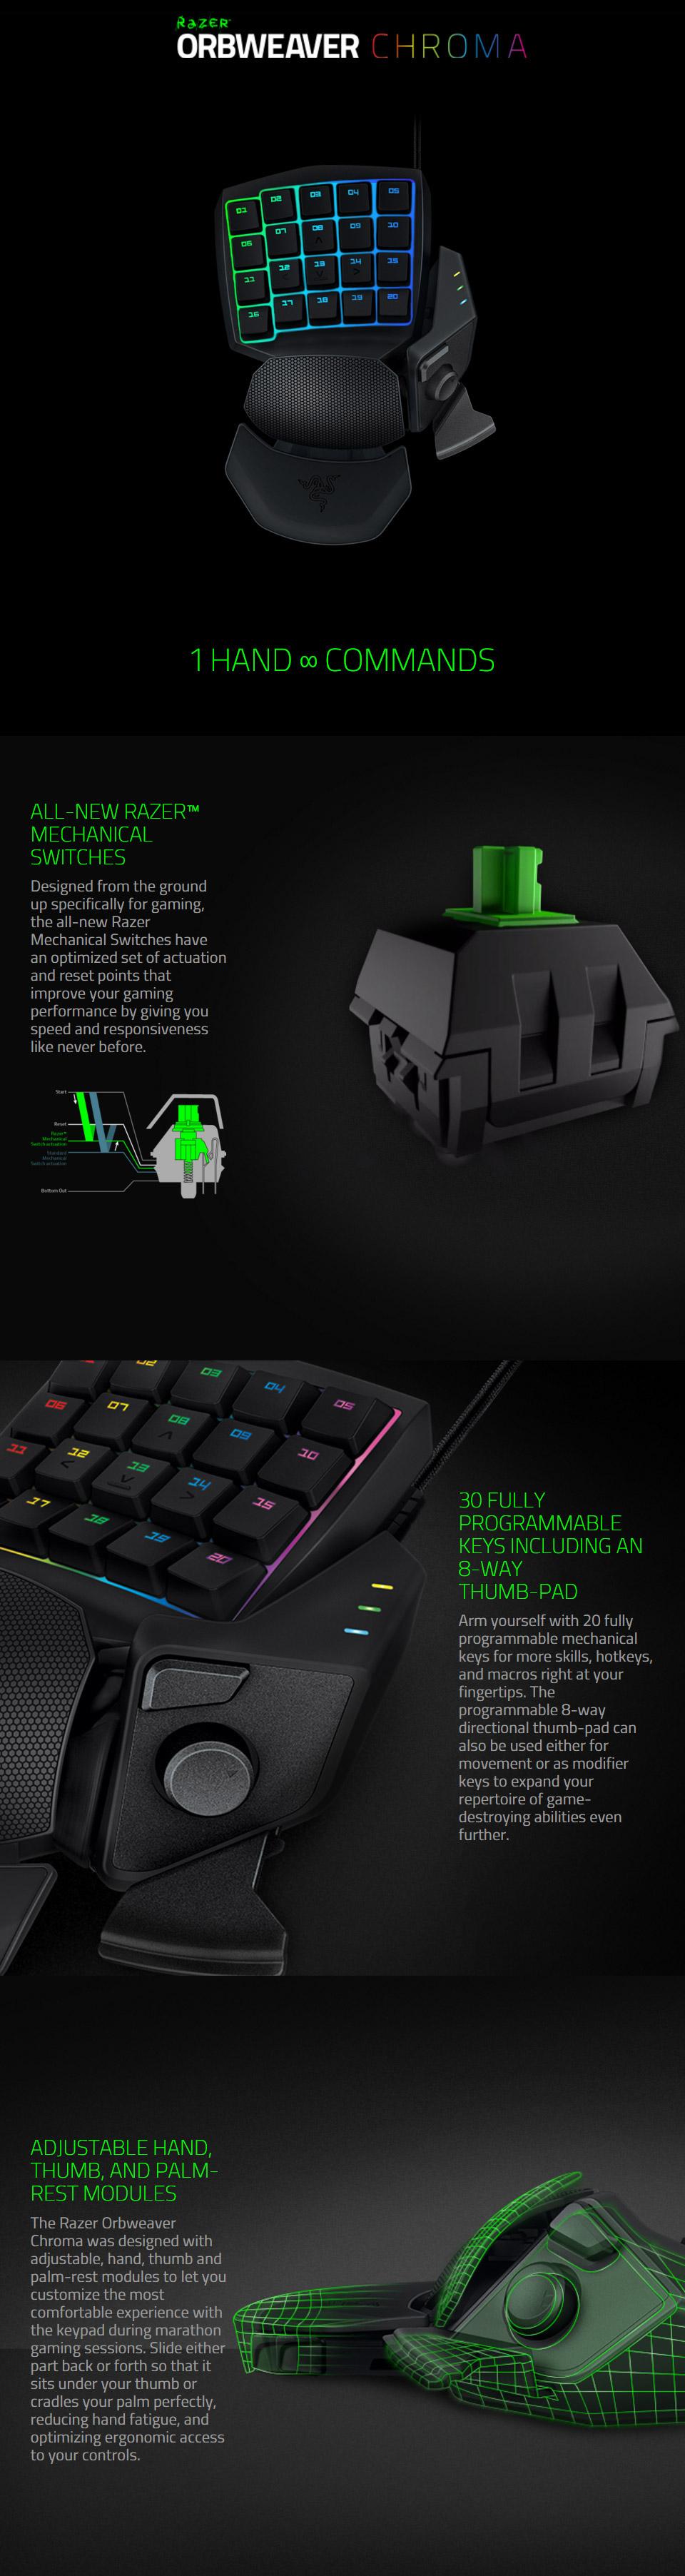 Razer Orbweaver Chroma Mechanical Gaming Keypad